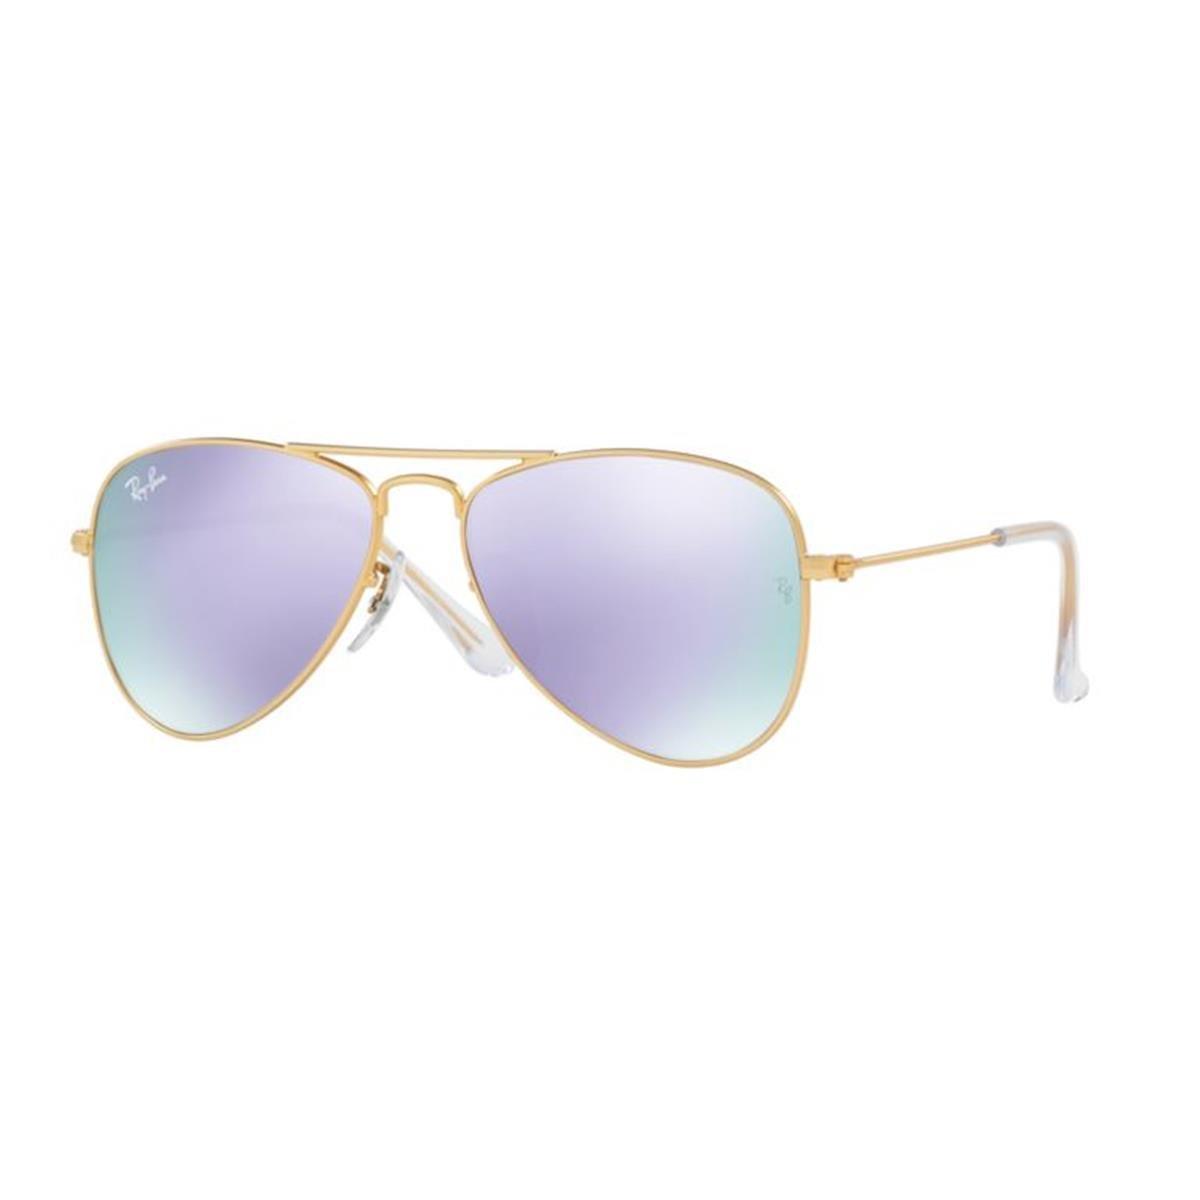 1e69c69fe9 Amazon.com  Ray-Ban Jr. Kids Aviator Kids Sunglasses (RJ9506) Gold  Matte Purple Metal - Non-Polarized - 50mm  Ray-Ban Junior  Clothing